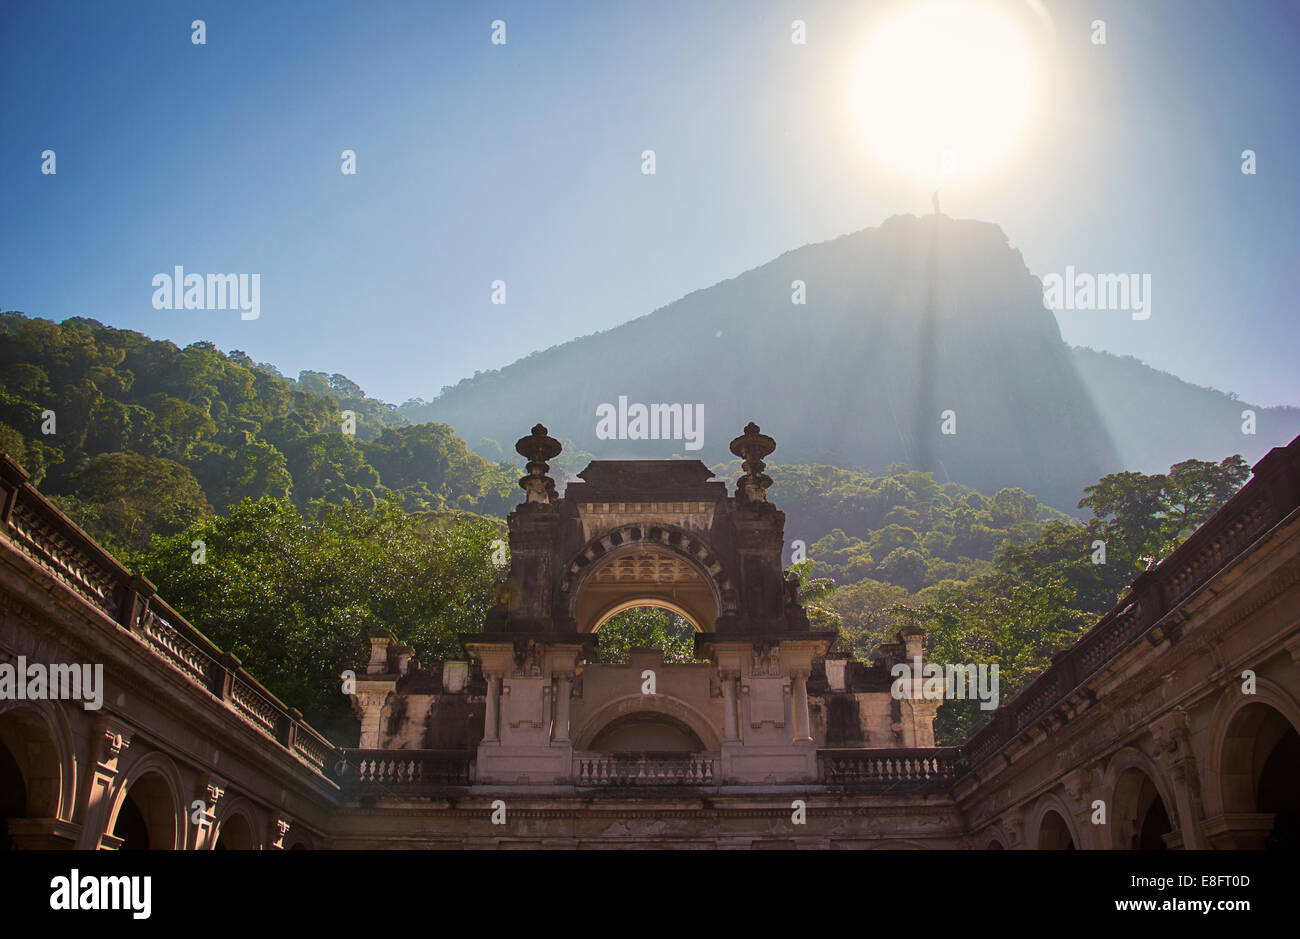 Distant view of Christ Redeemer Statue, Rio de Janeiro, Brazil - Stock Image